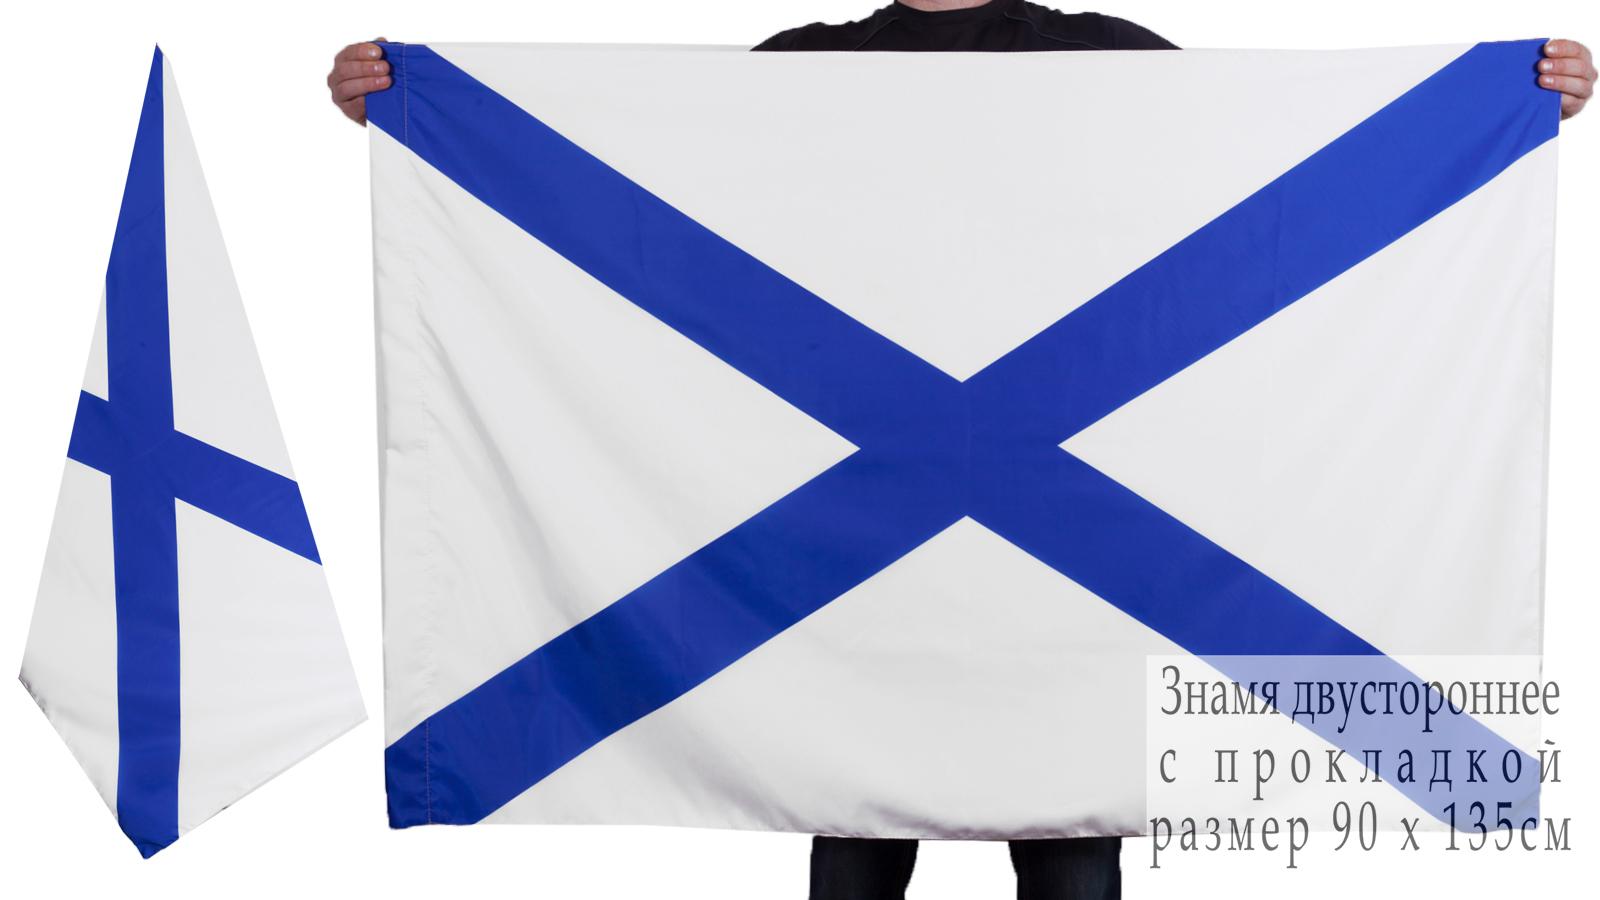 Купить двухсторонний Андреевский флаг ВМФ